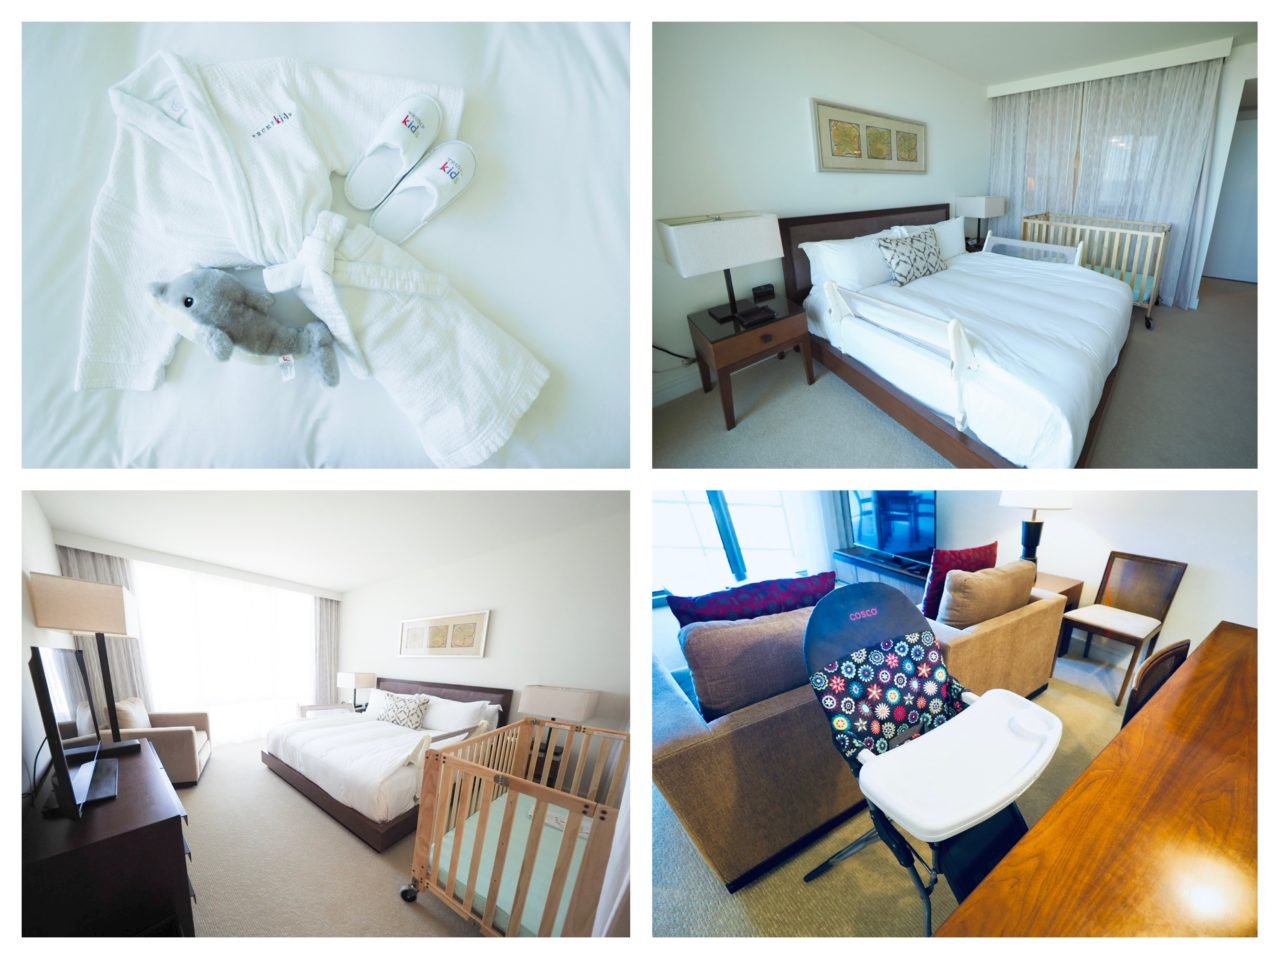 img 5013 - Trump International Hotel Waikiki - ファミリーステイに大満足!トランプ インターナショナル ホテルステイ